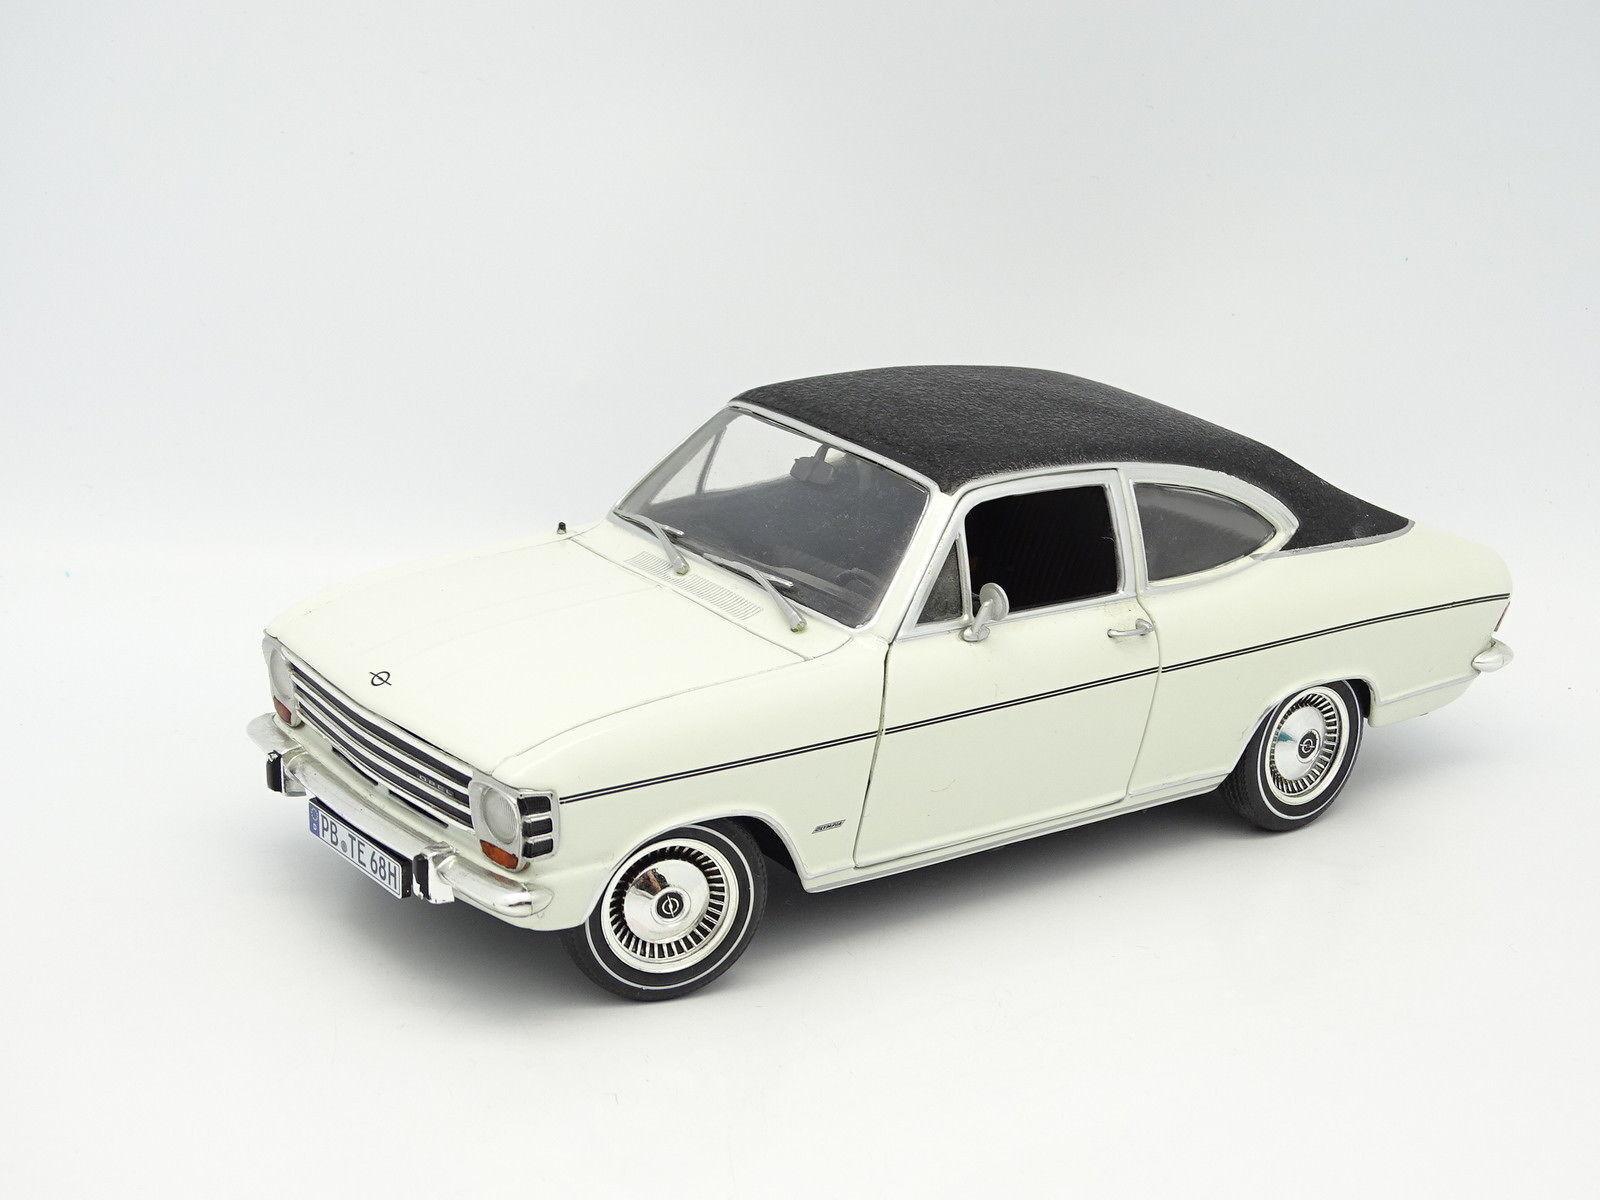 Joyeux noel Revell 1/18 Opel Kadett Olympia 1968 Blanche | Design Attrayant